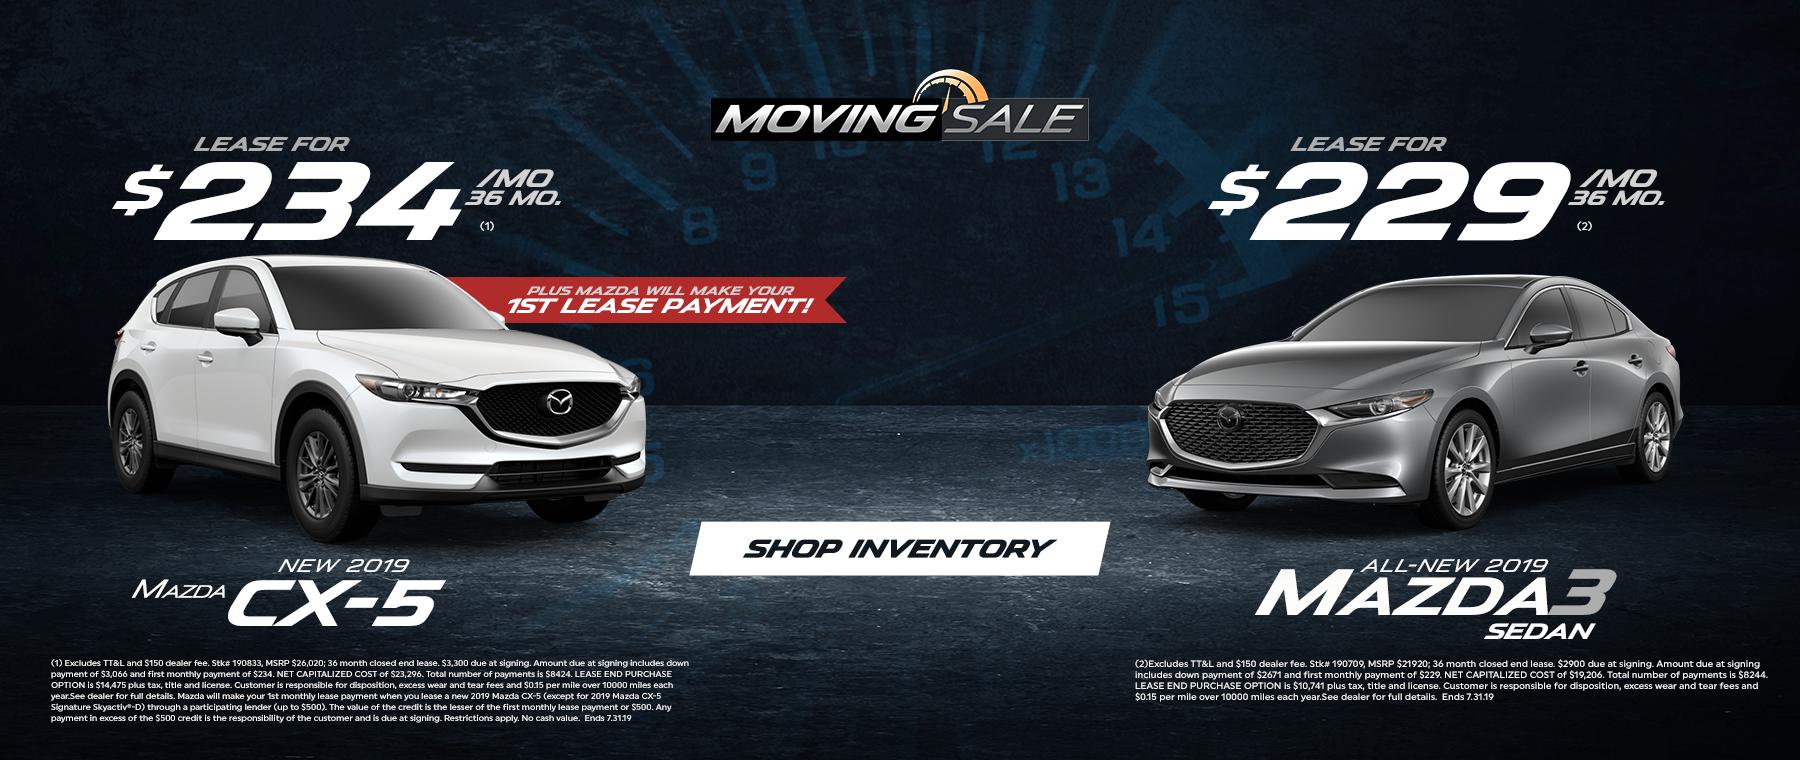 CX-5 and Mazda3 Sale at Jeff Haas Mazda